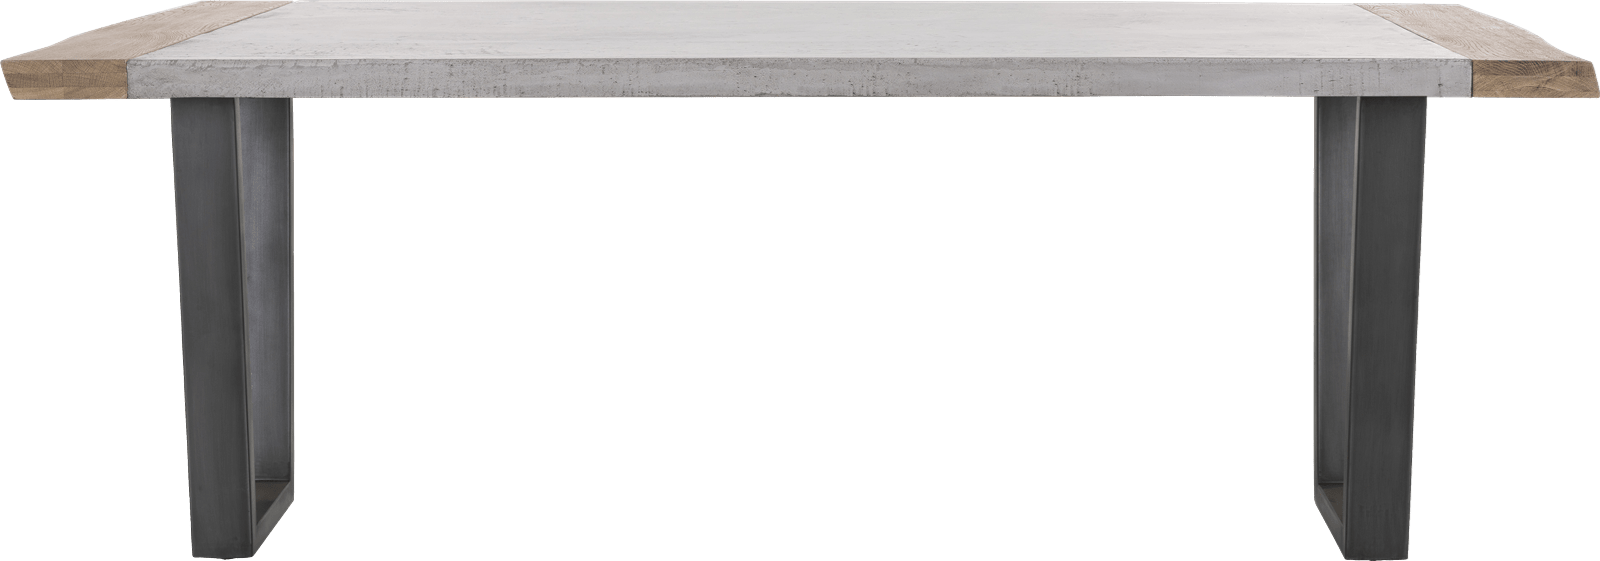 Farmer - eetkamertafel 180 x 100 cm